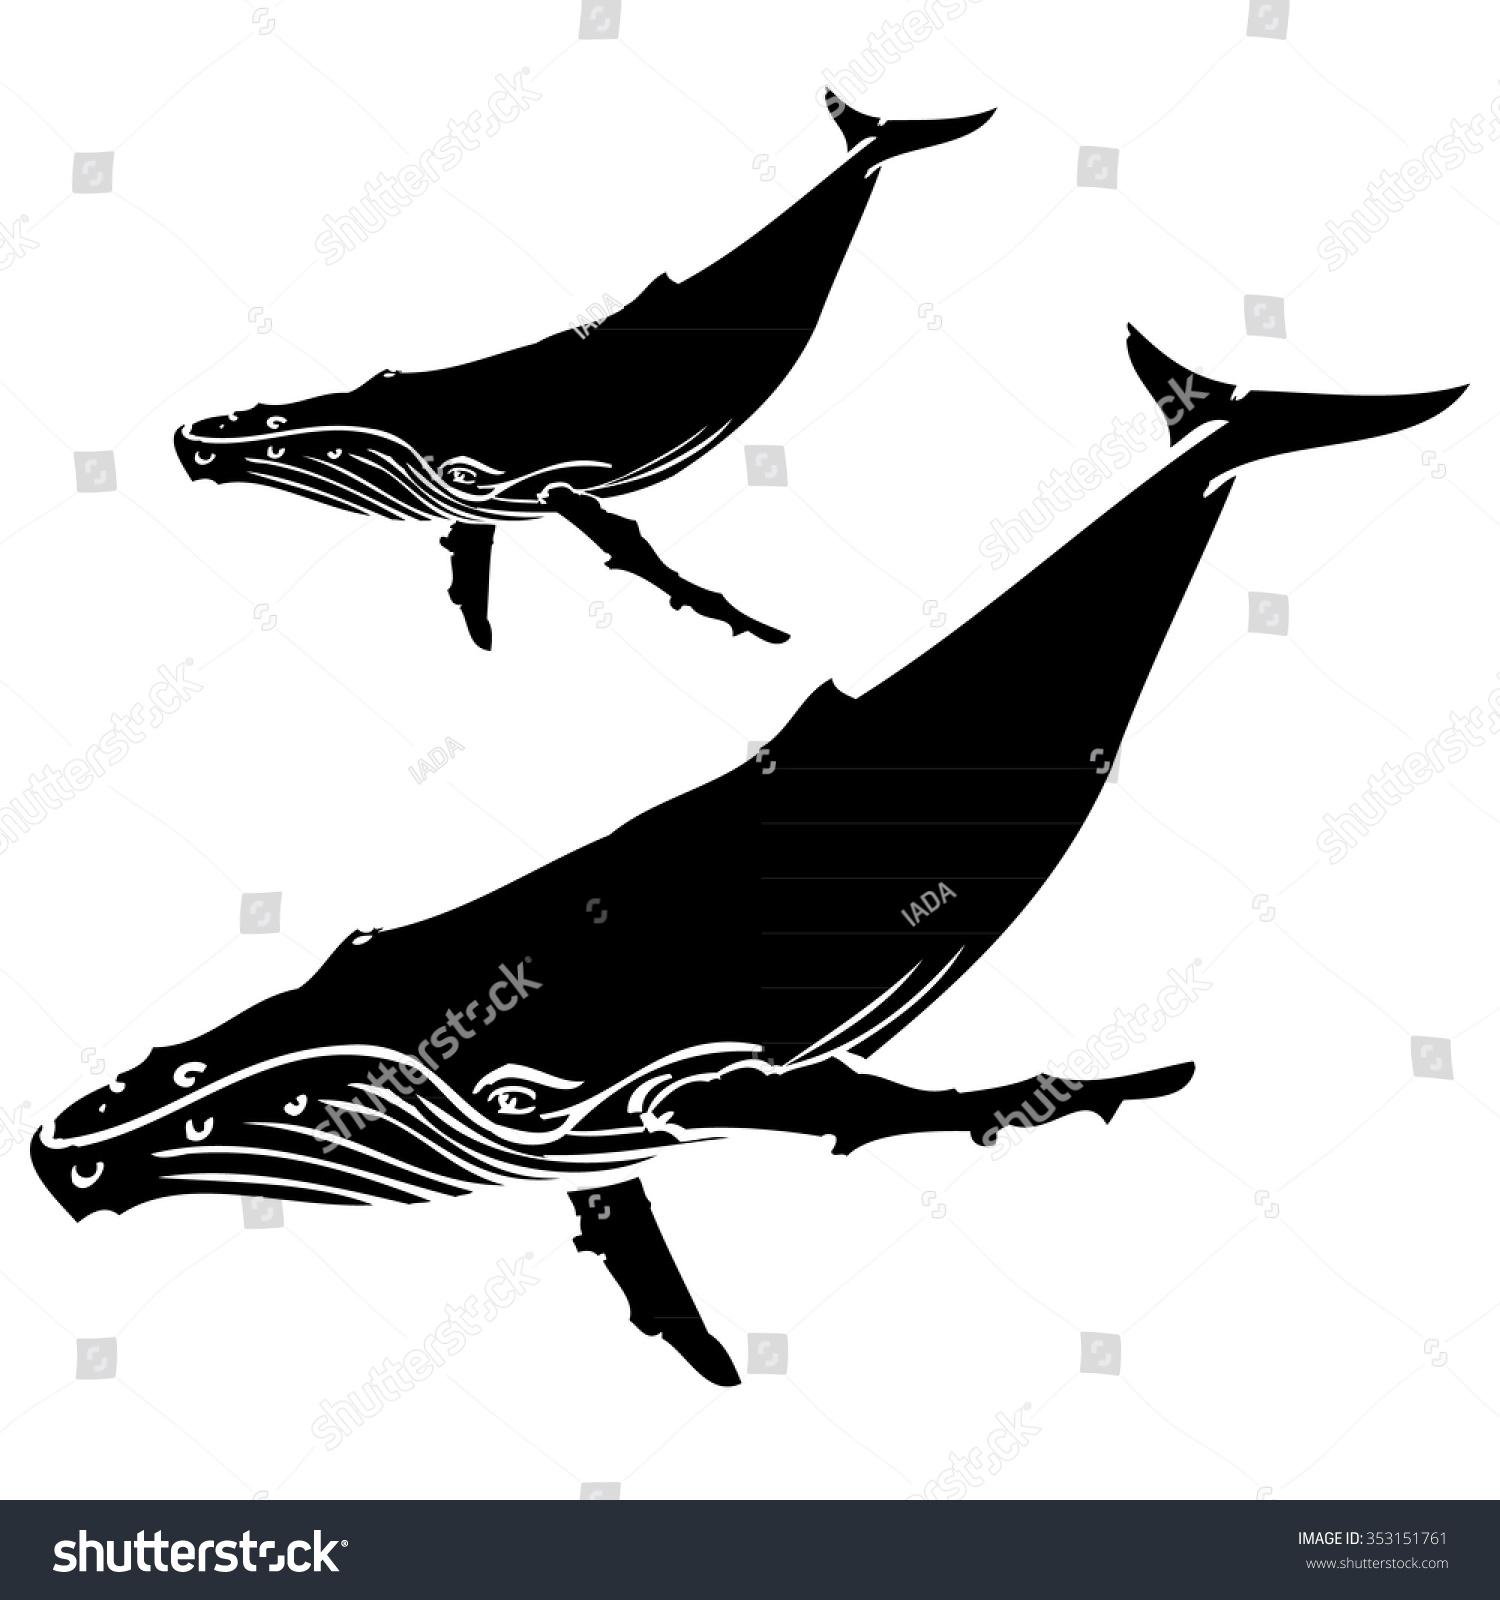 Humpback Whale - Illustration - 353151761 : Shutterstock